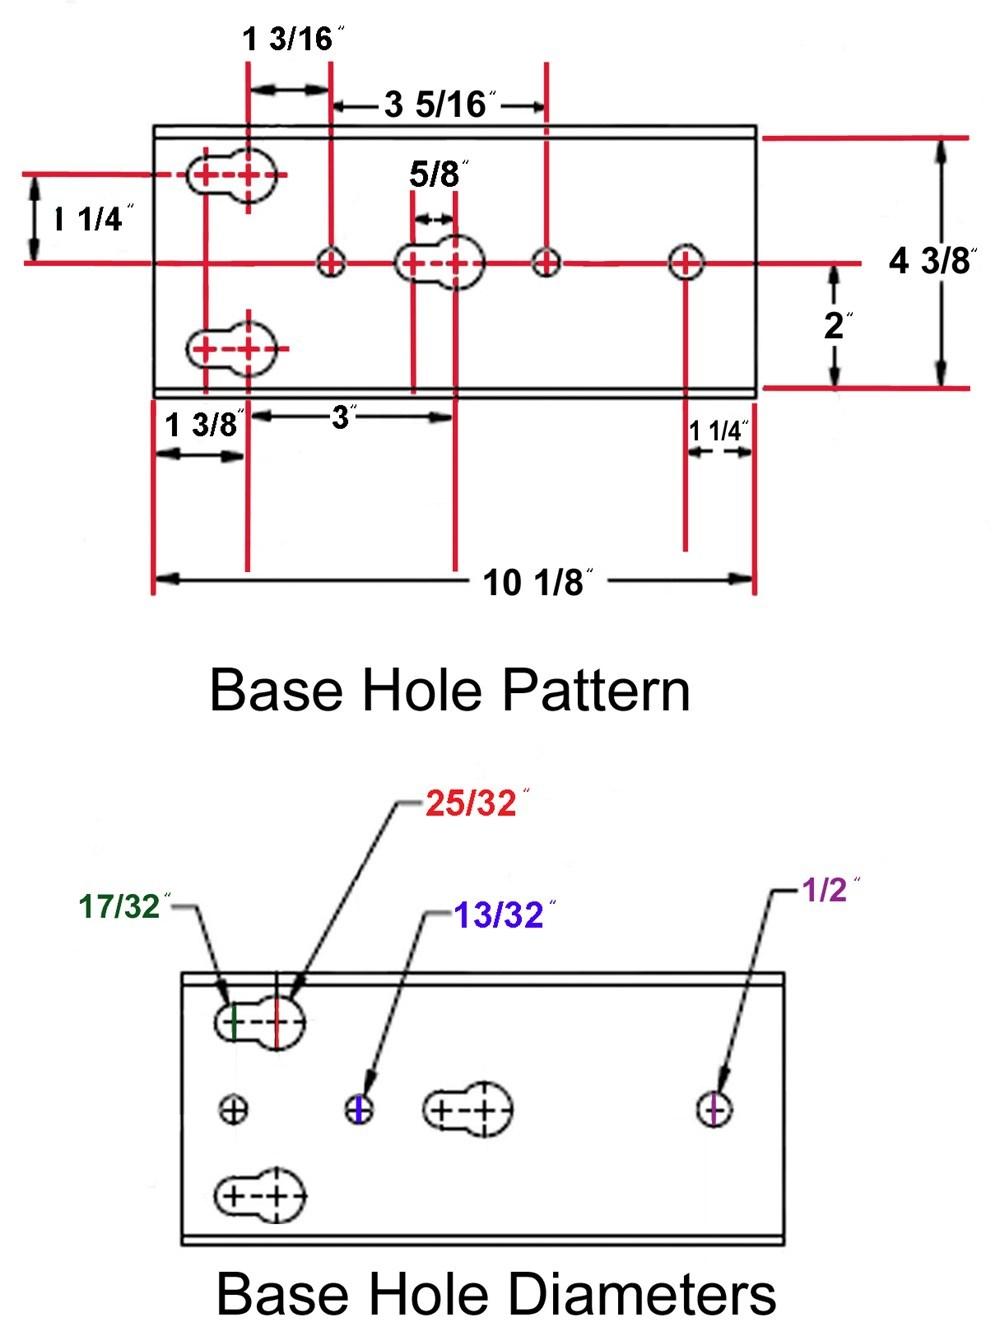 superwinch wiring diagram for atv superwinch 4500 wiring diagram wiring diagram data  superwinch 4500 wiring diagram wiring